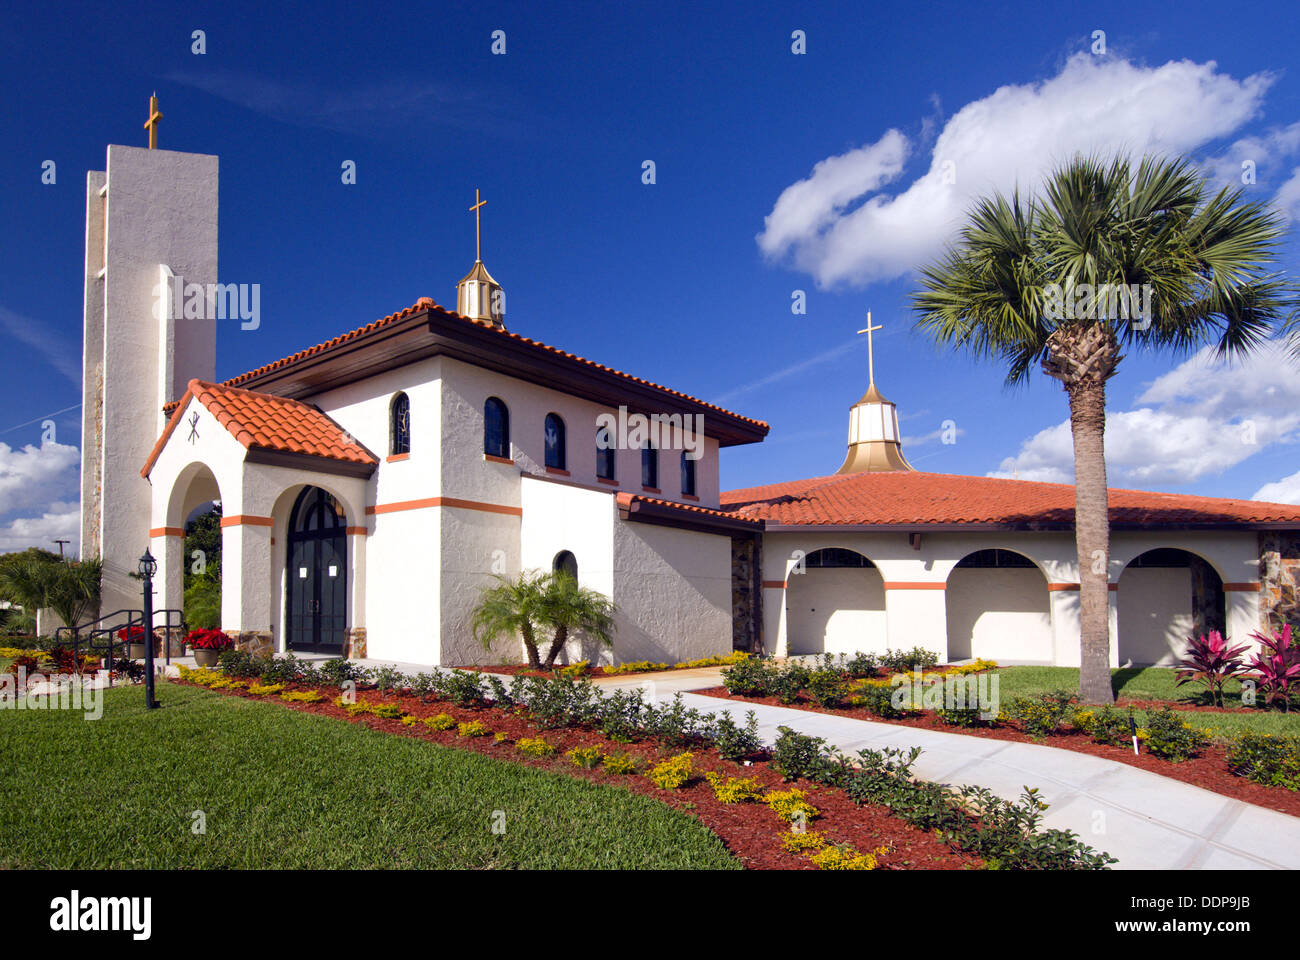 St  Thomas Aquinas Catholic Church in St  Cloud near